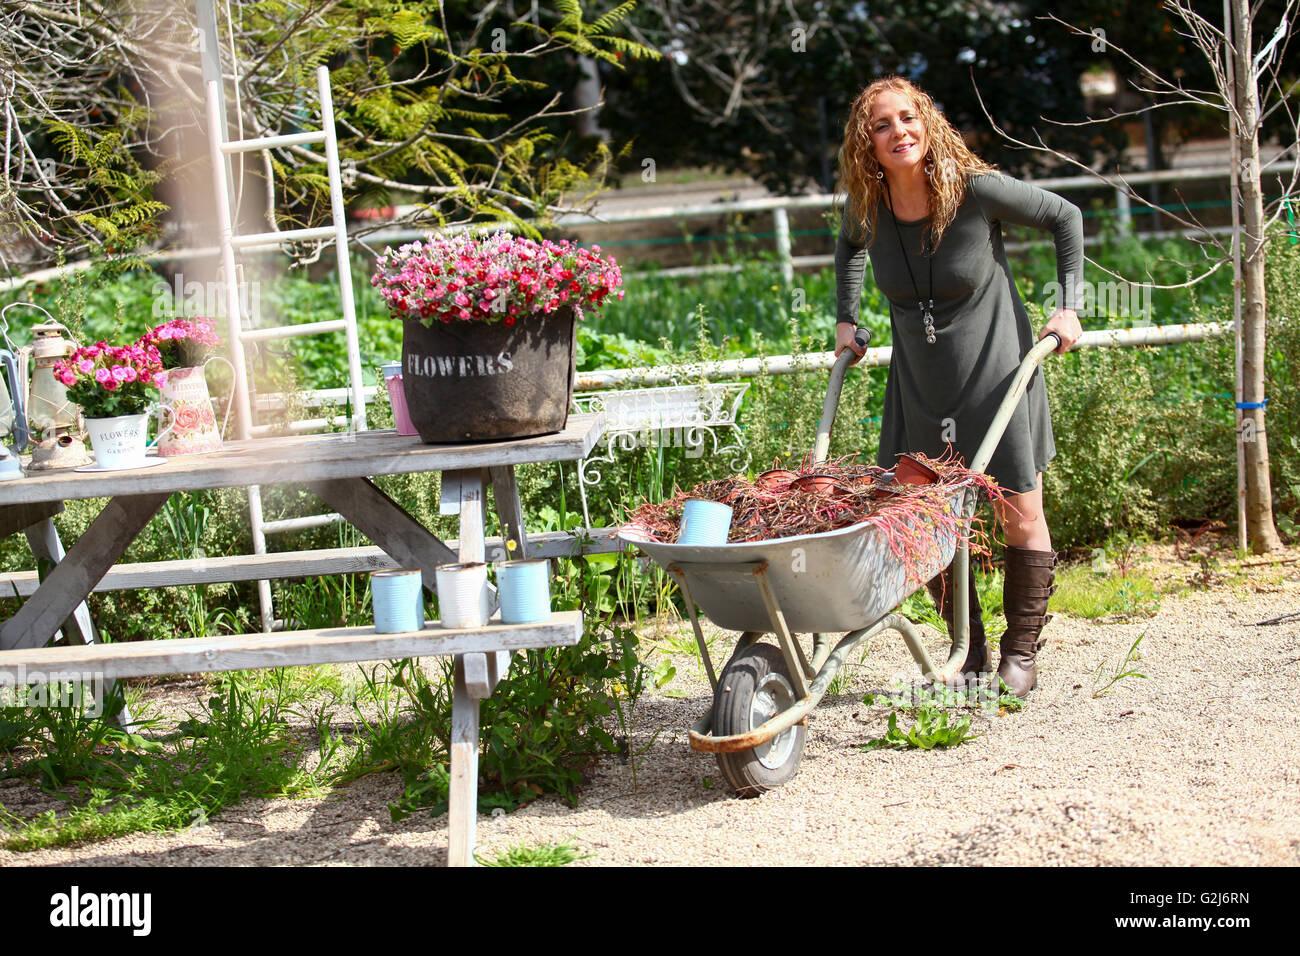 Woman works in her garden arranging flowers in a flowerpot Stock Photo